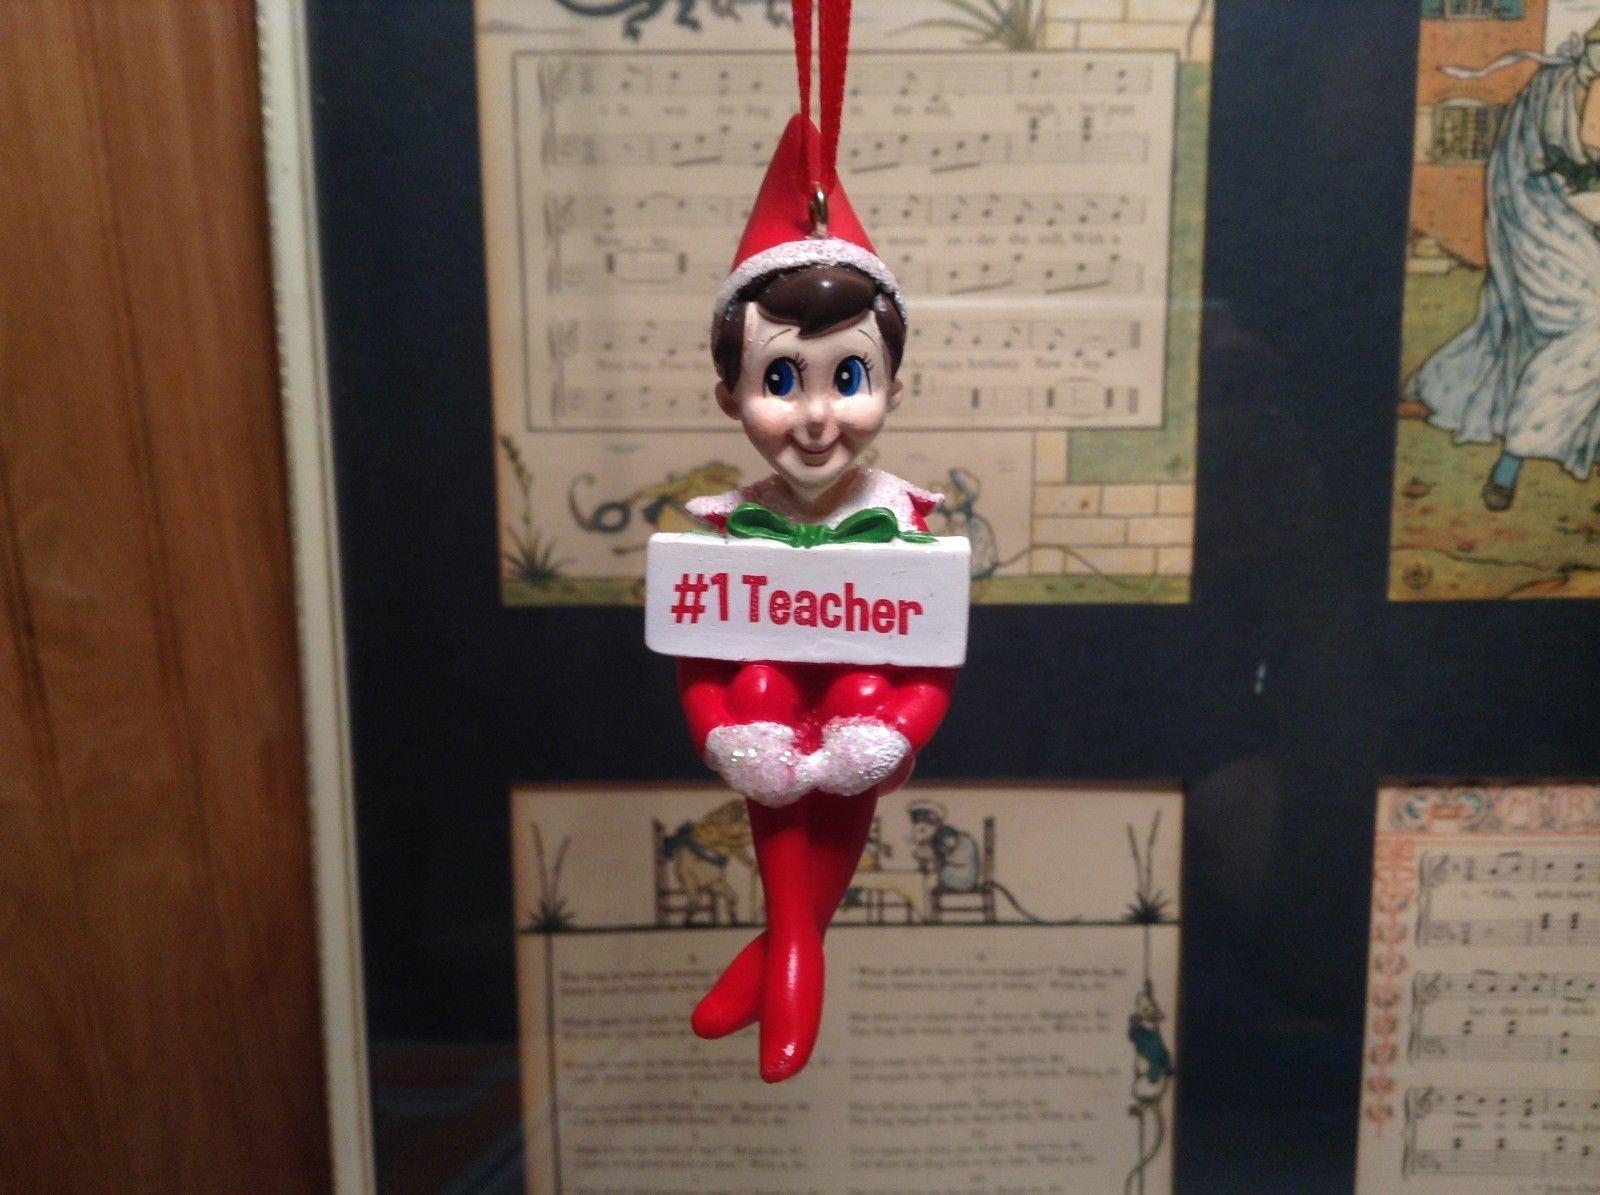 Dept 56 - Elf on the Shelf - #1 Teacher Number One  Christmas Ornament